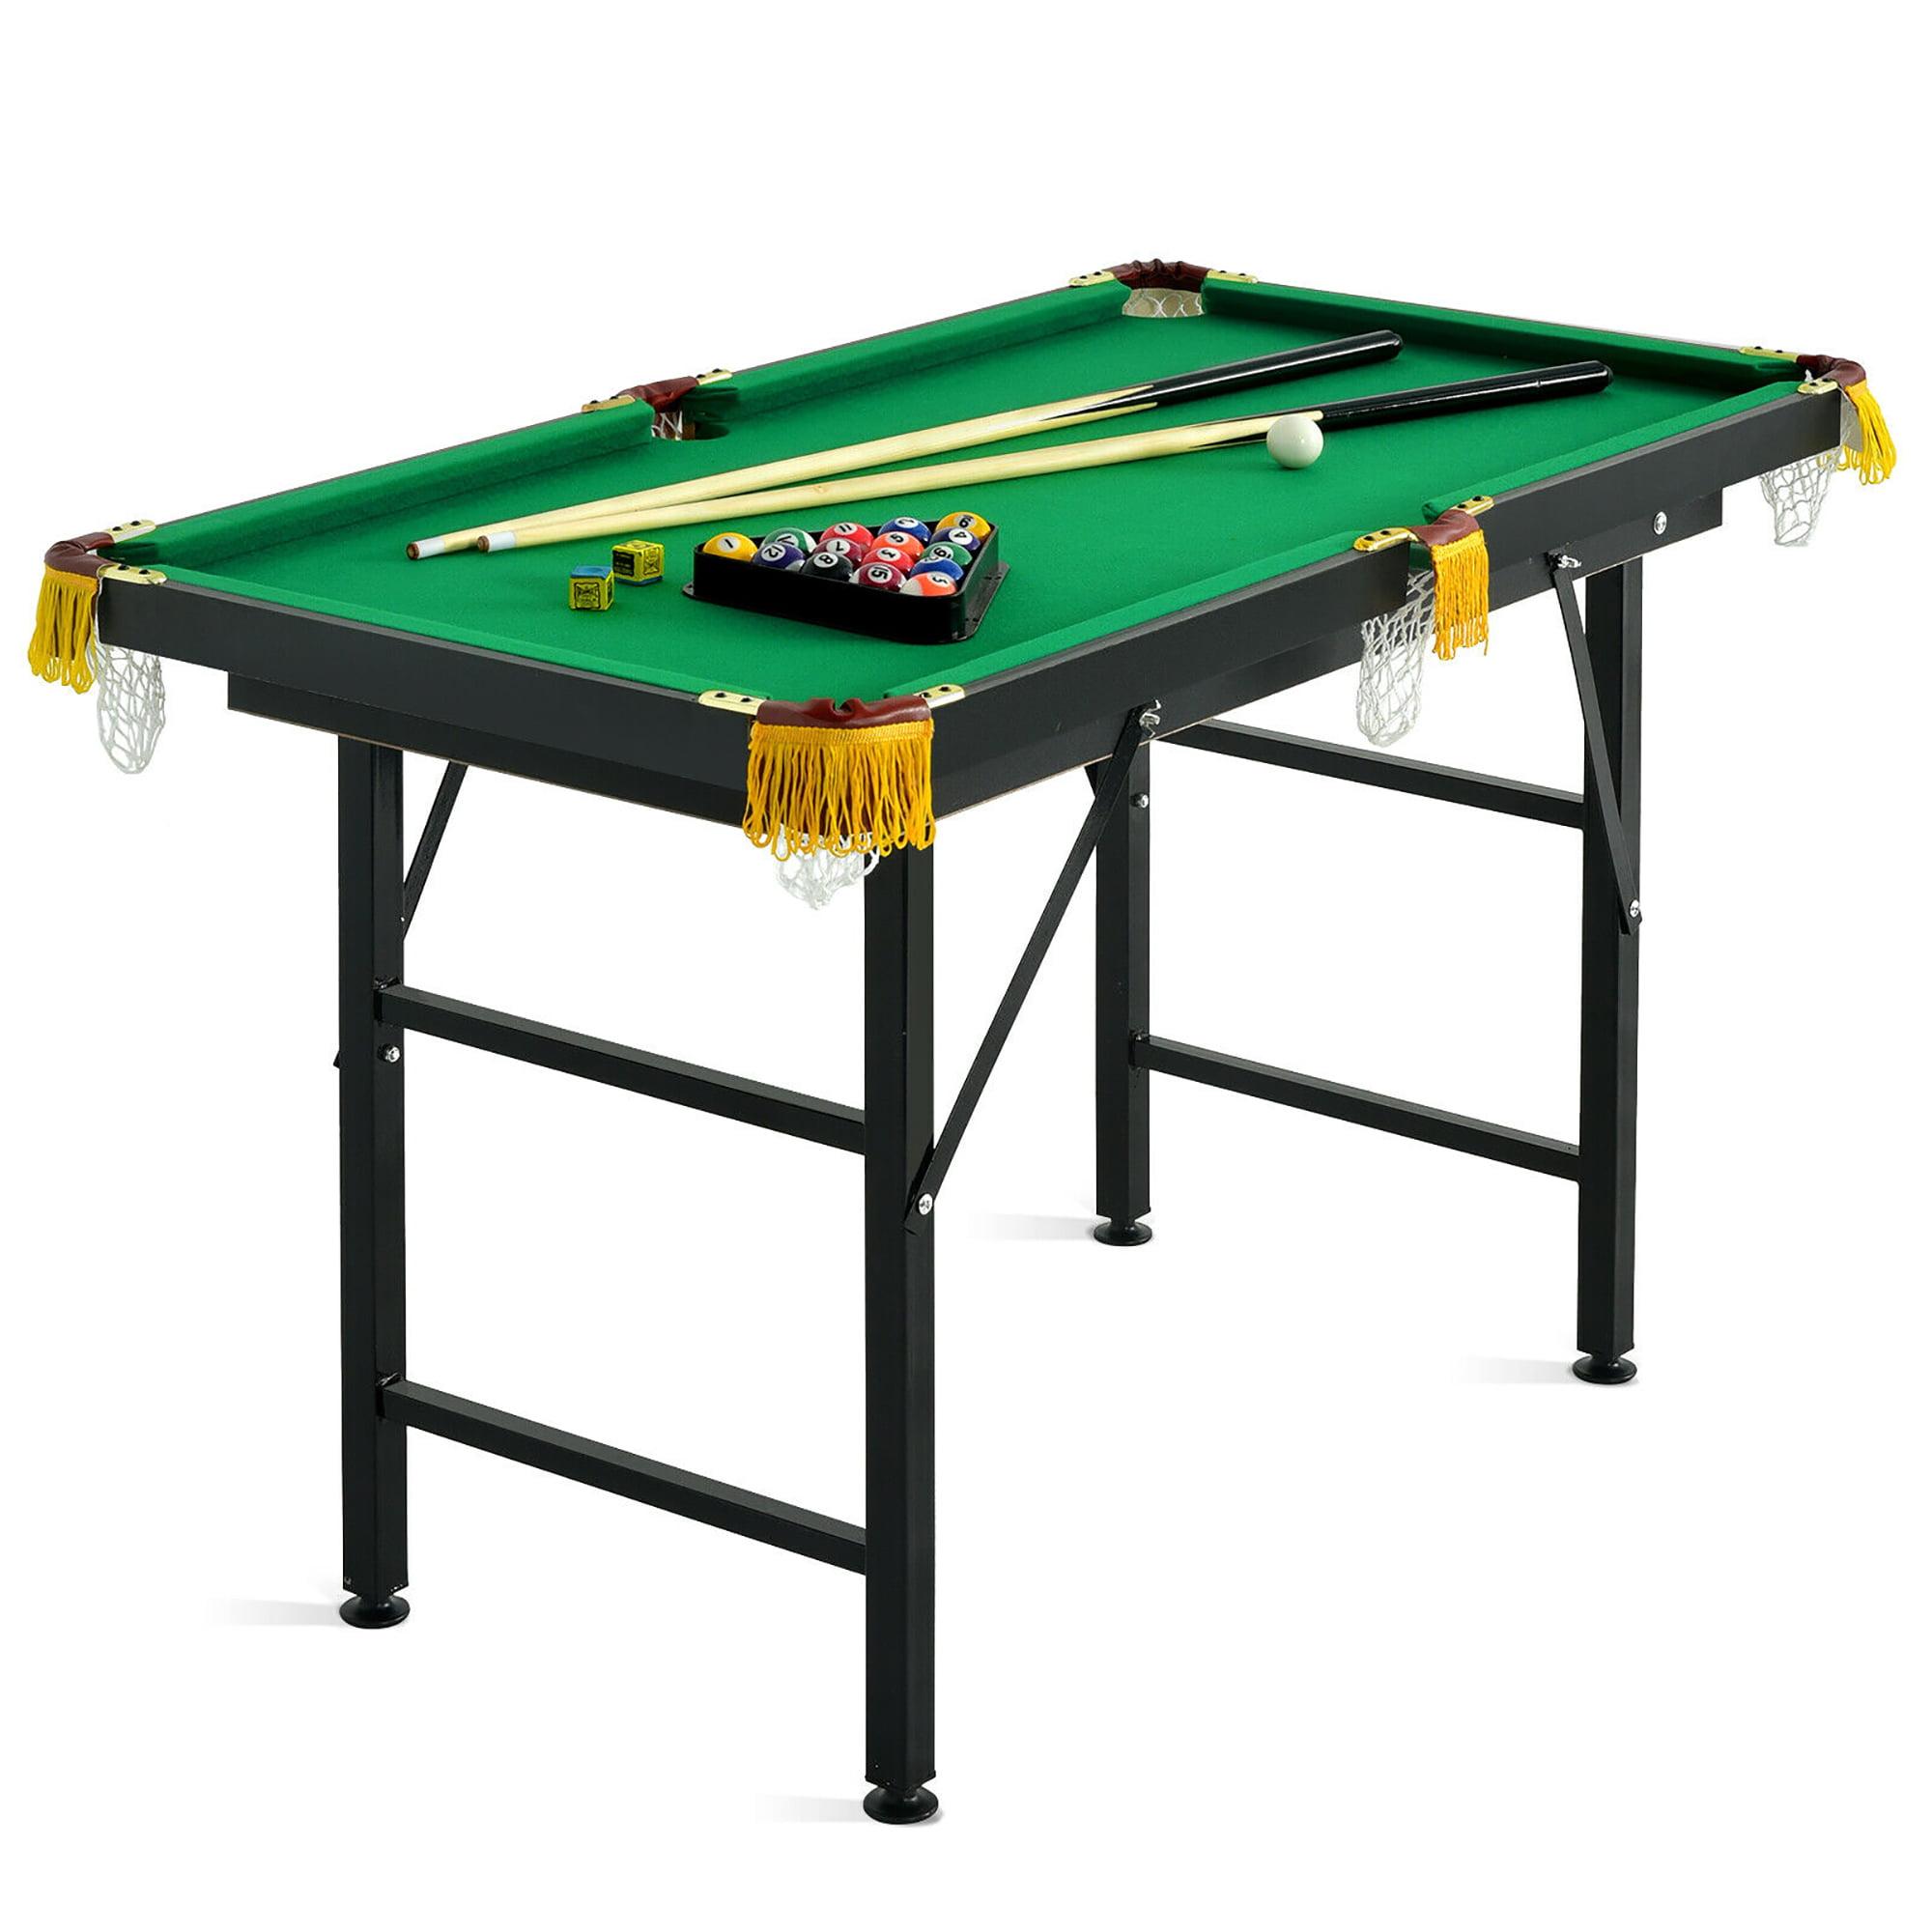 "Costway 47"" Folding Billiard Table Pool Game Table Indoor Kids w"